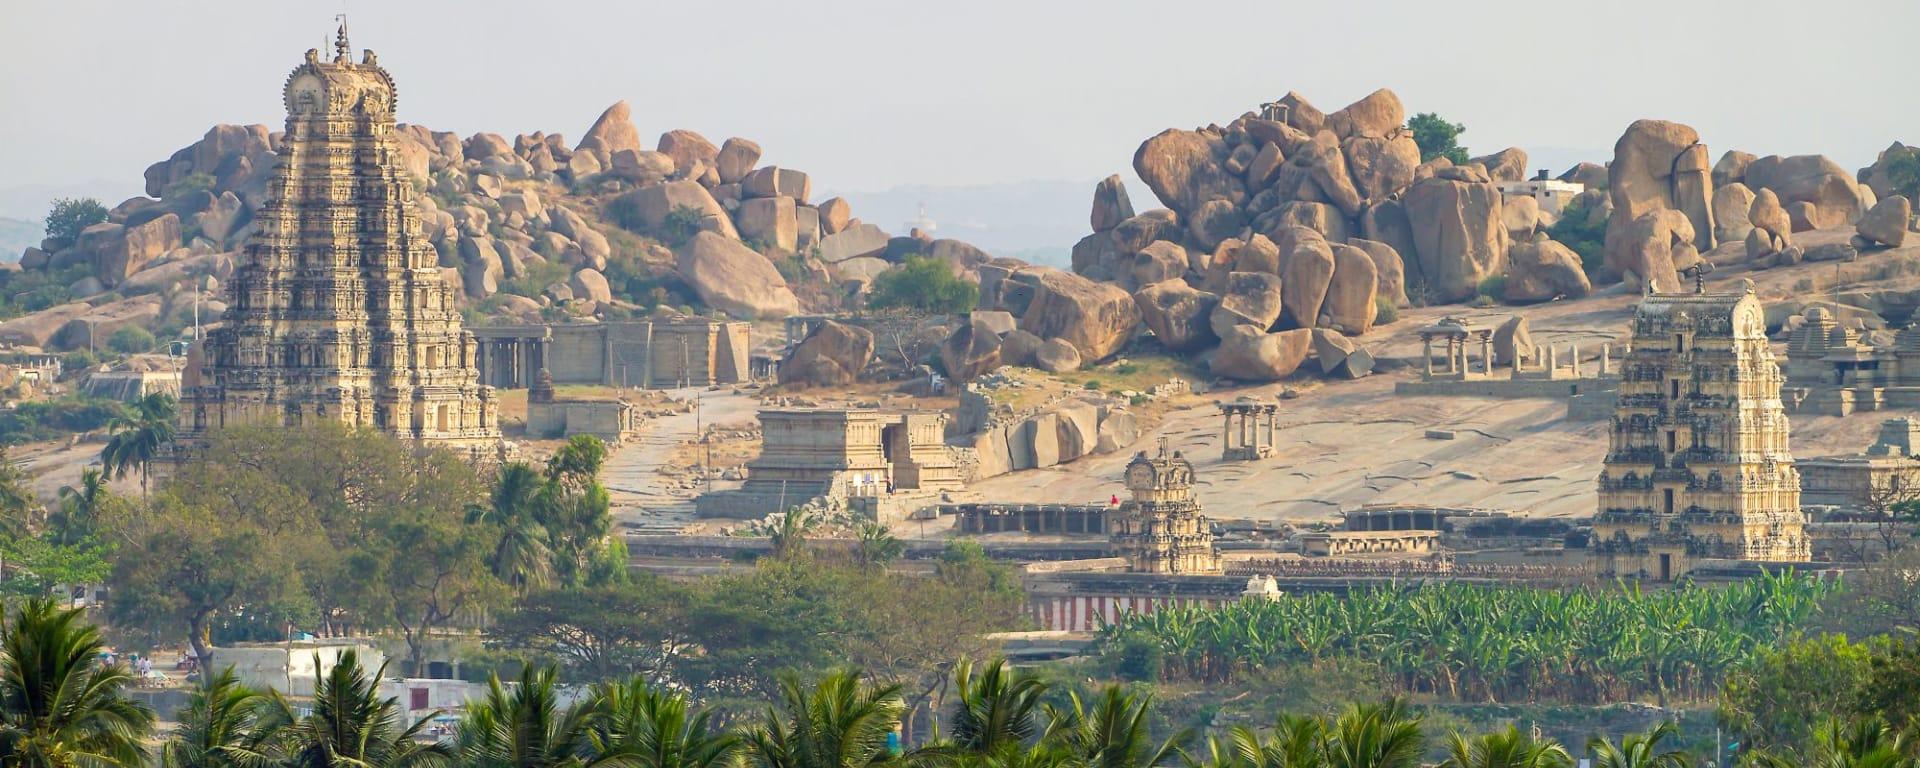 Karnatakas kulturelles Vermächtnis ab Goa: Virupaksha Temple in Hampi